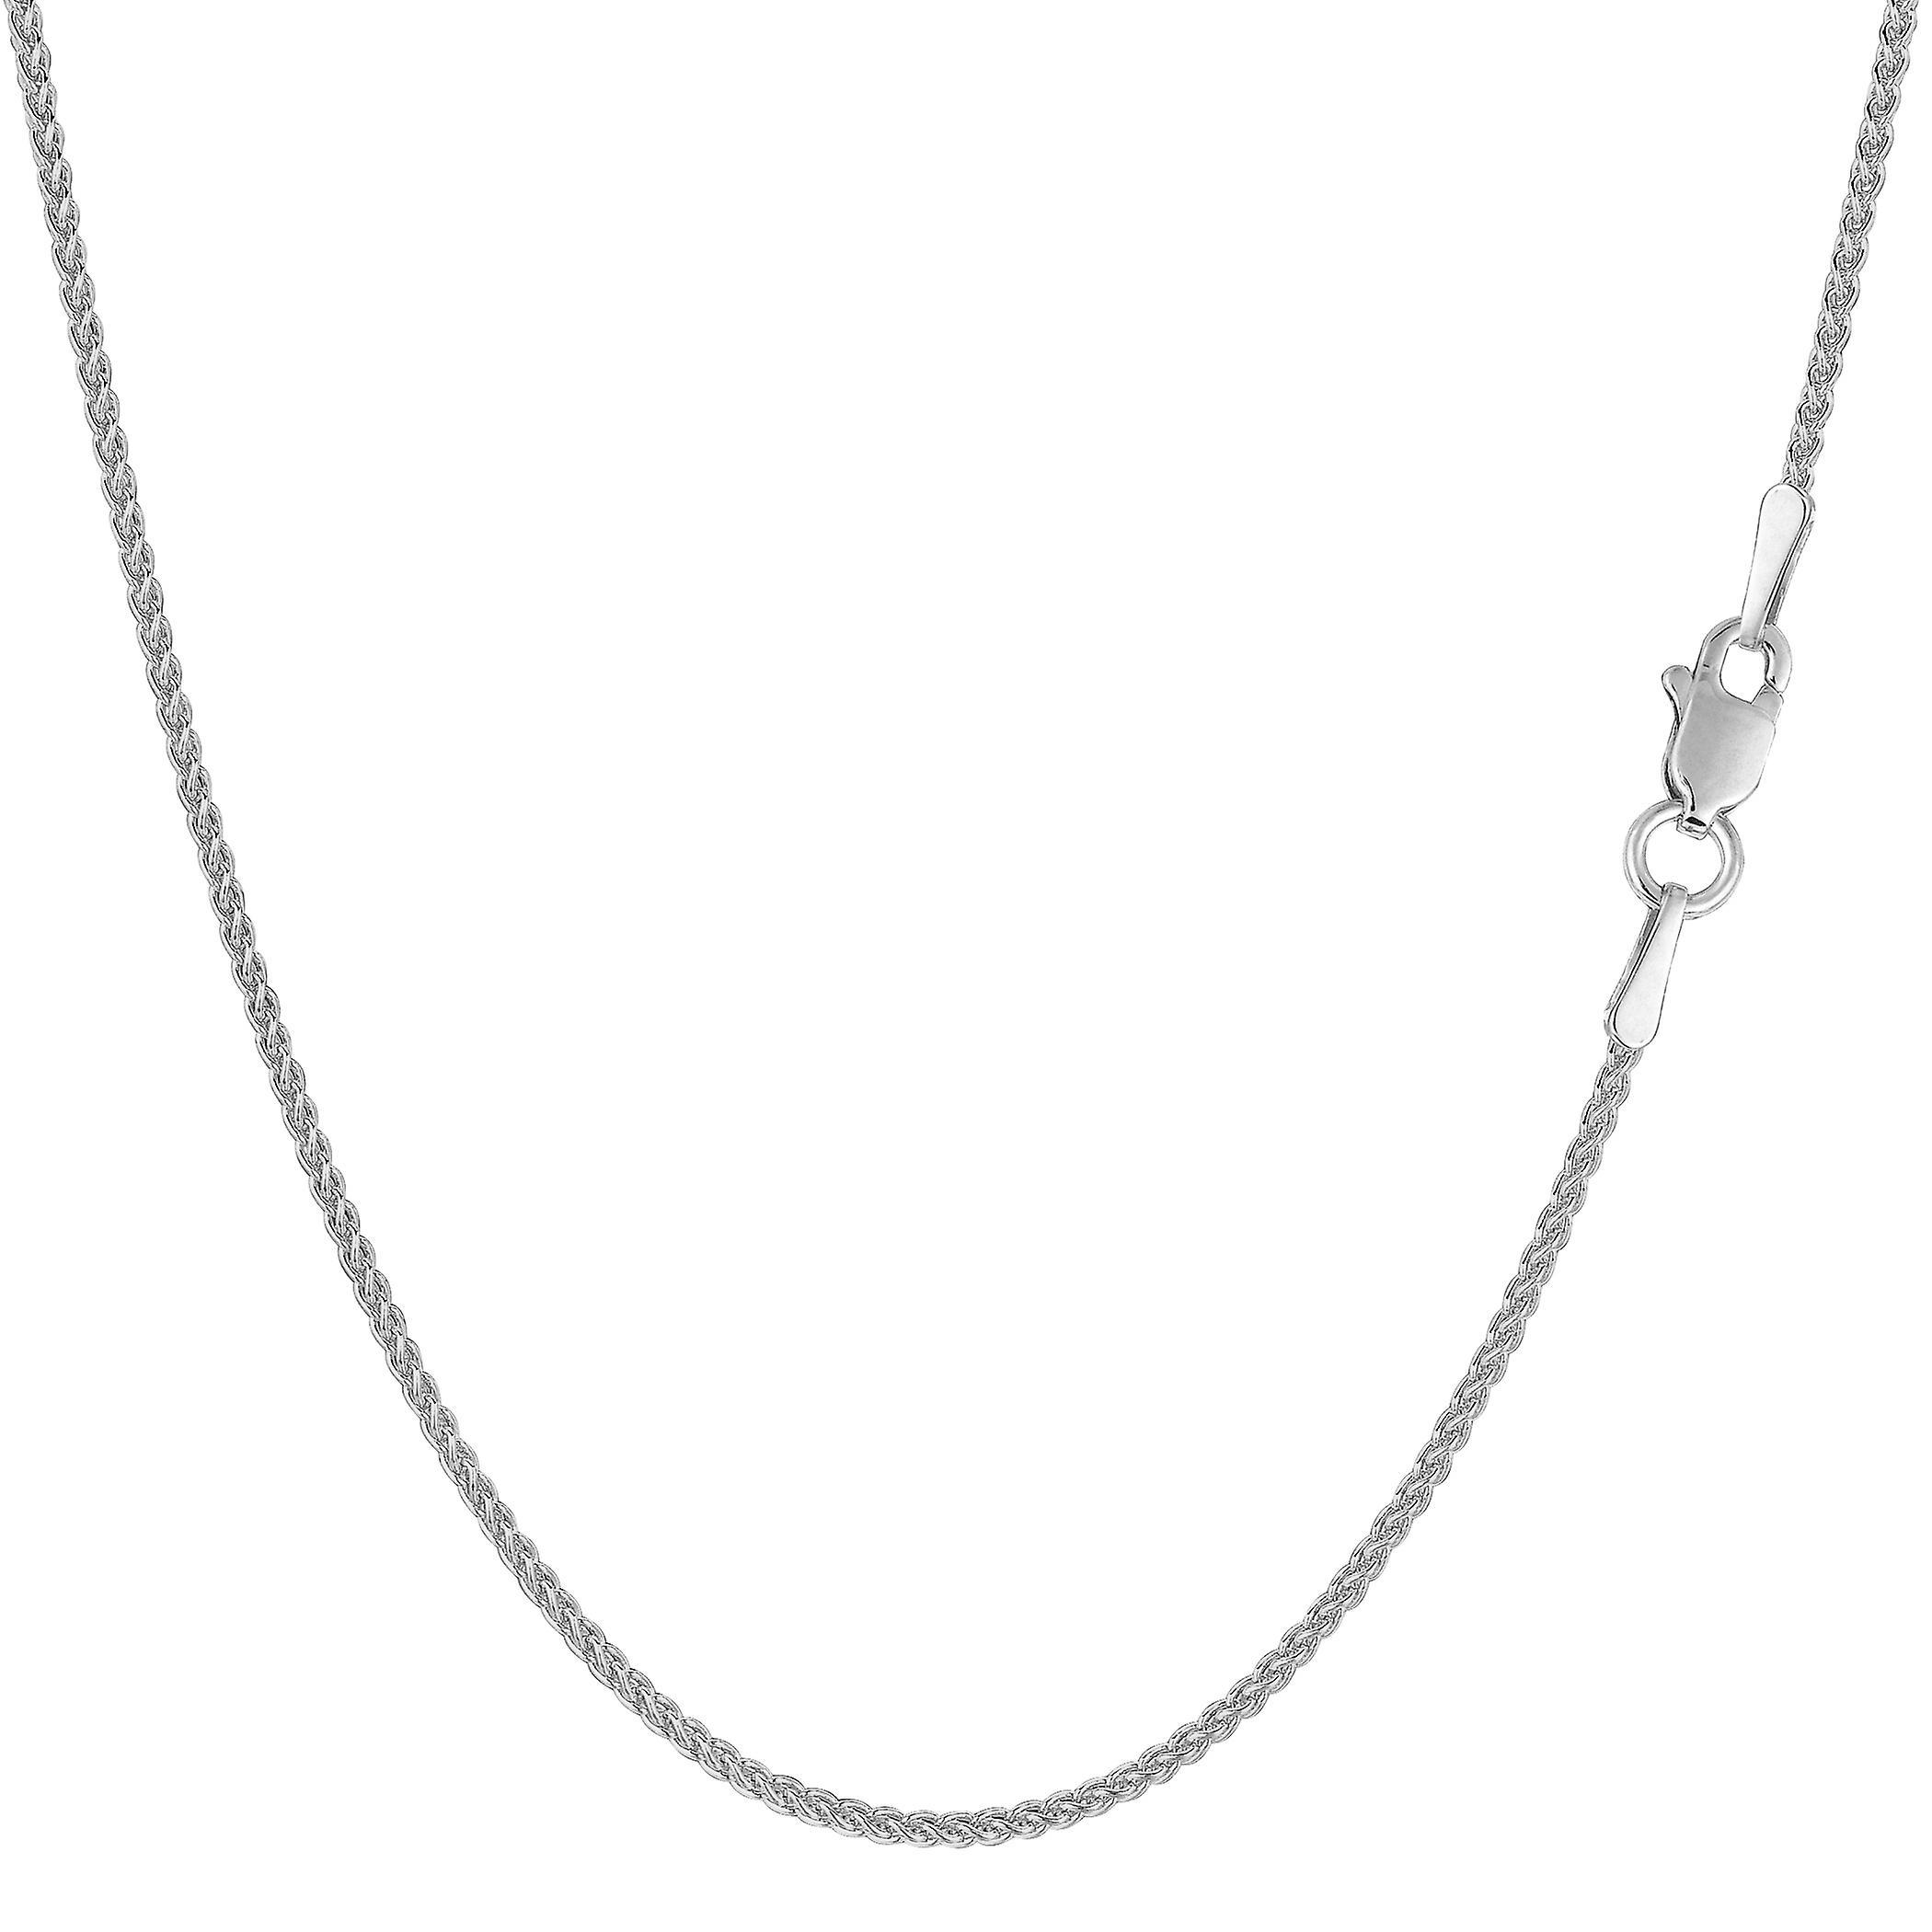 14k blanc or Round Wheat chaîne collier, 1.2mm